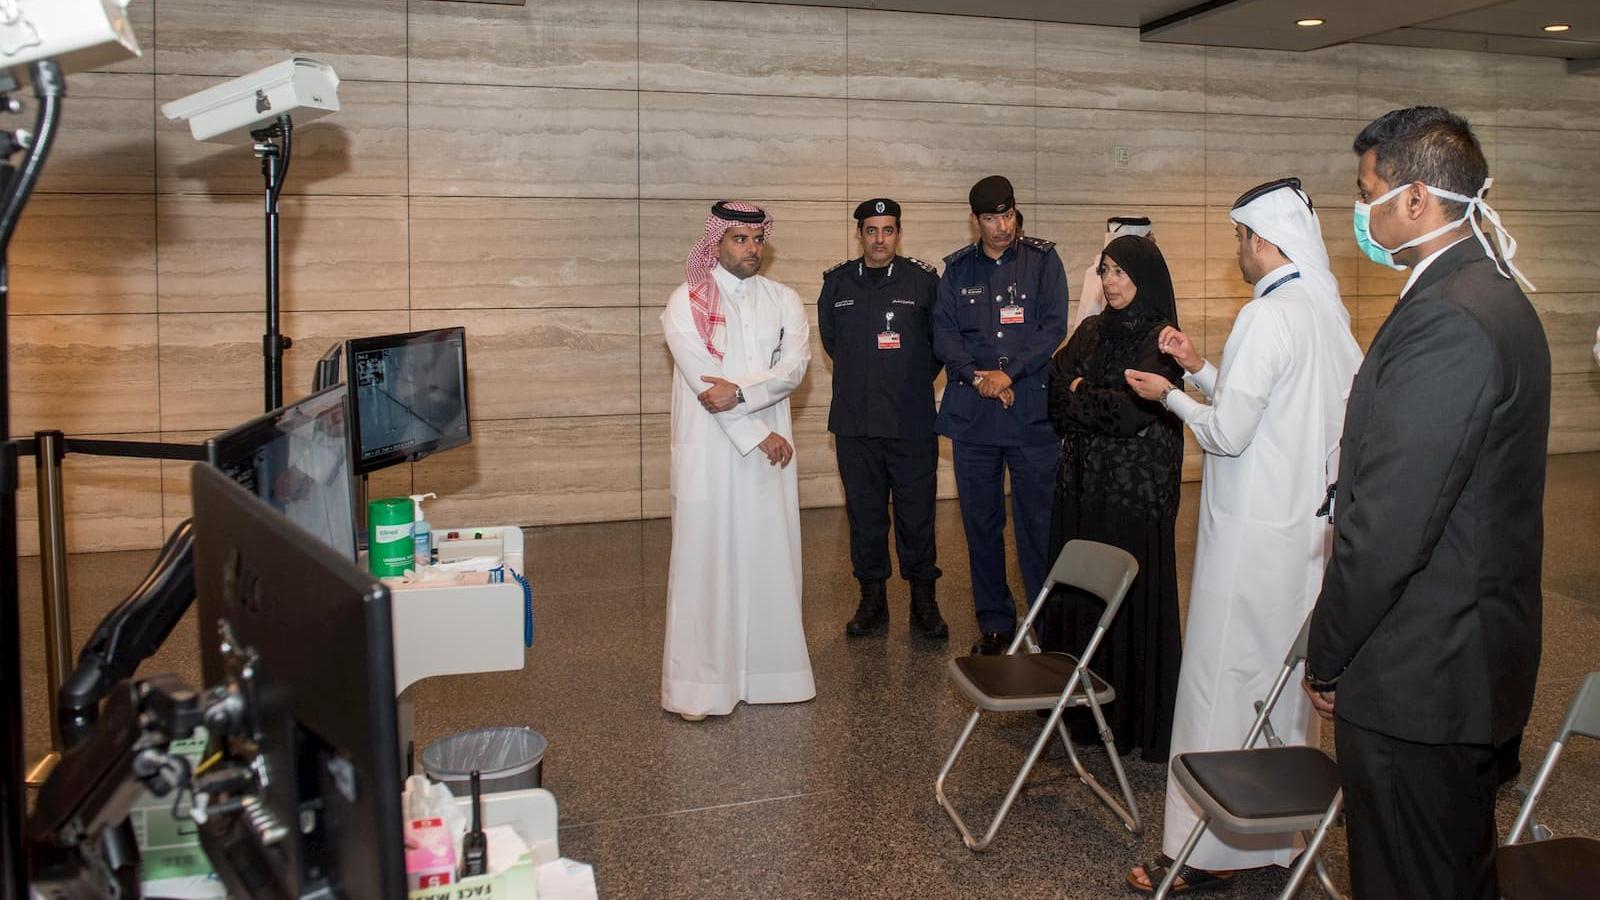 Health Minister reviews coronavirus detection procedures at HIA